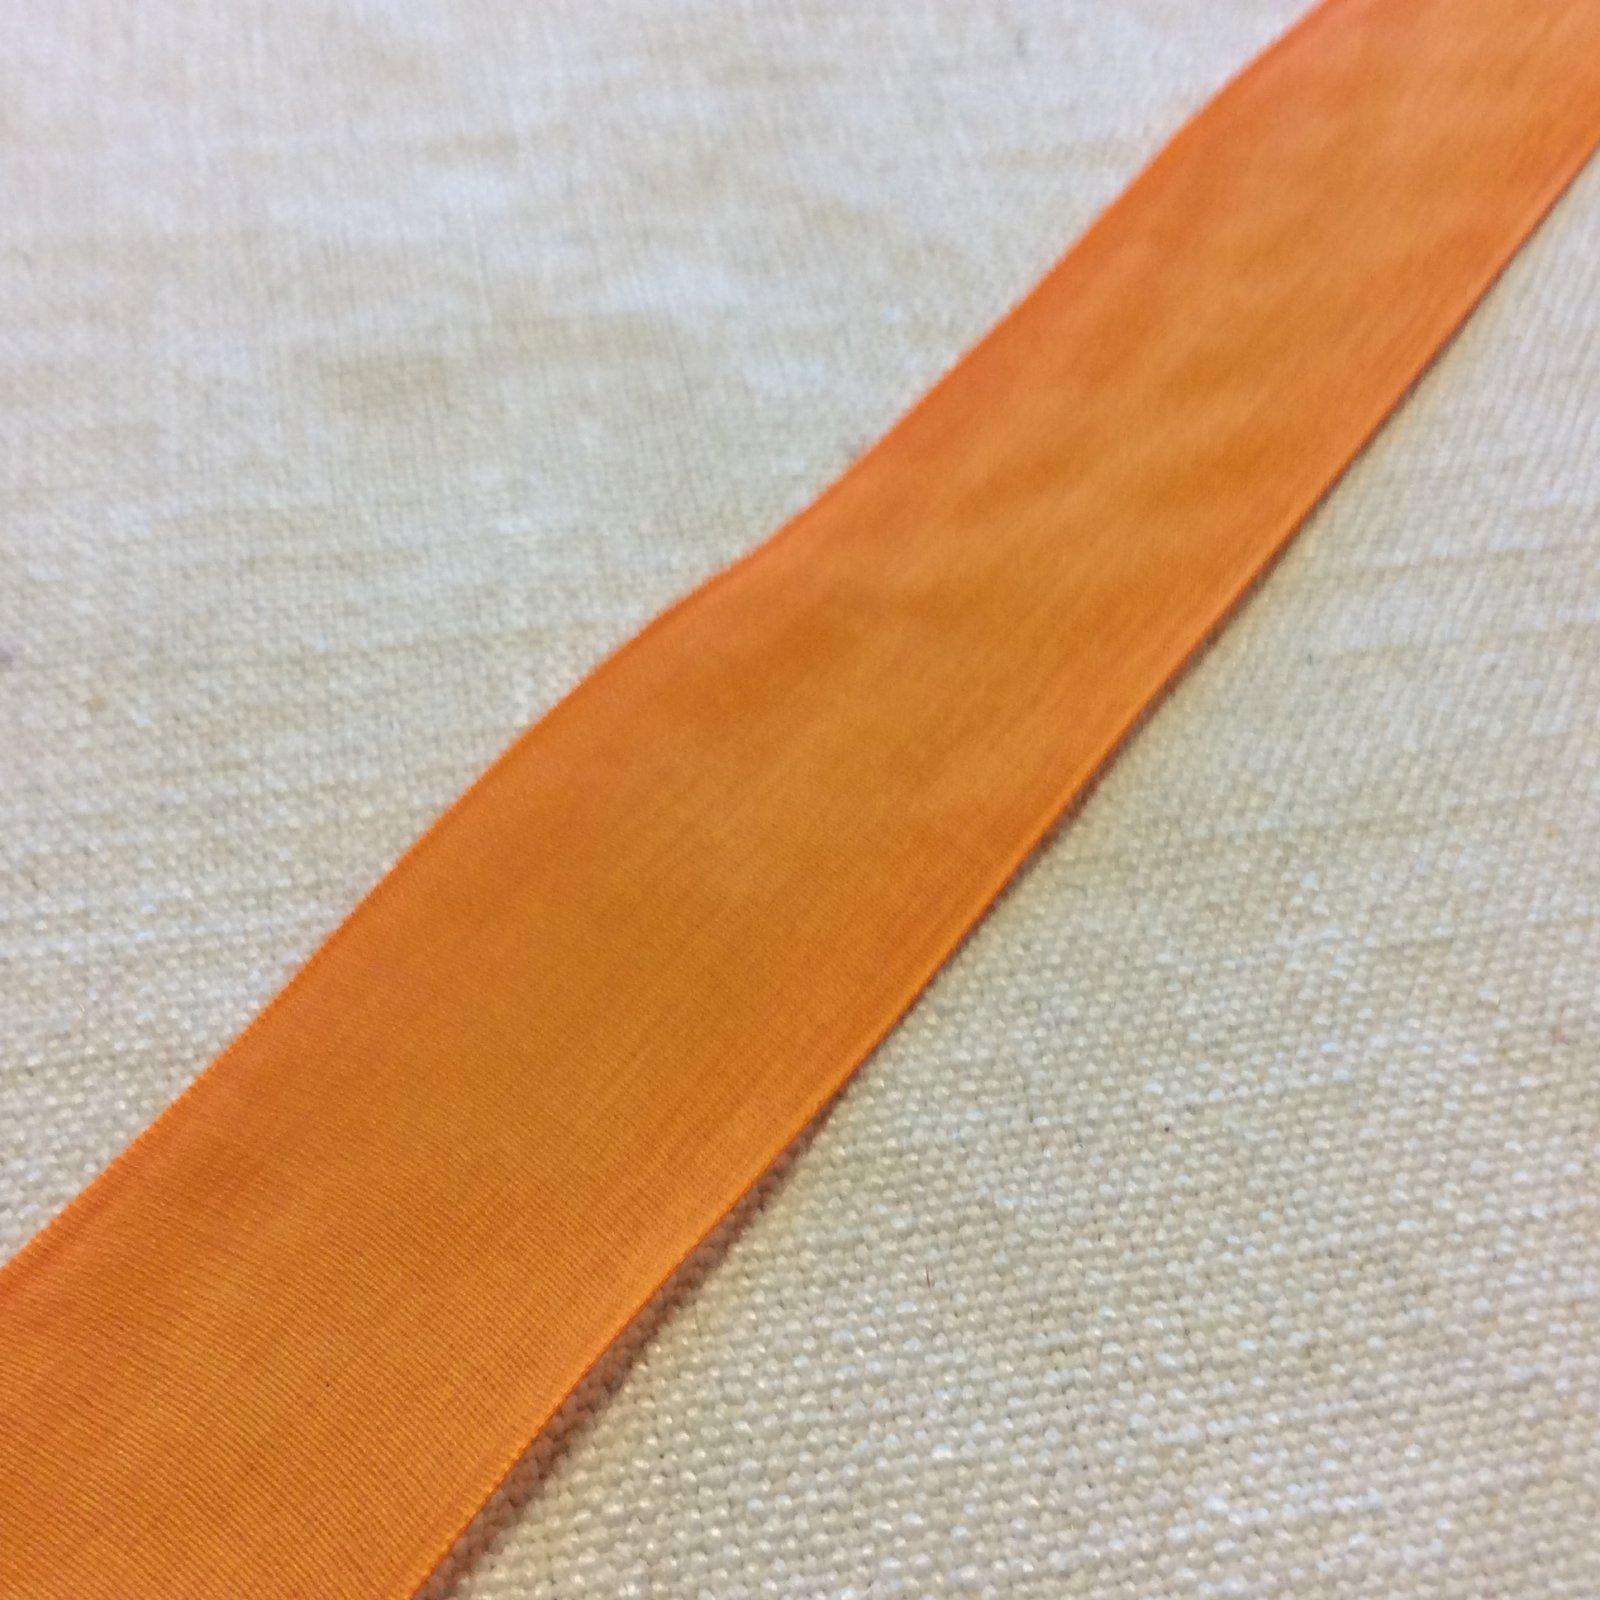 Faux Linen Spanish Yellow Orange 1.5 Decorative Trim Ribbon RIB1363